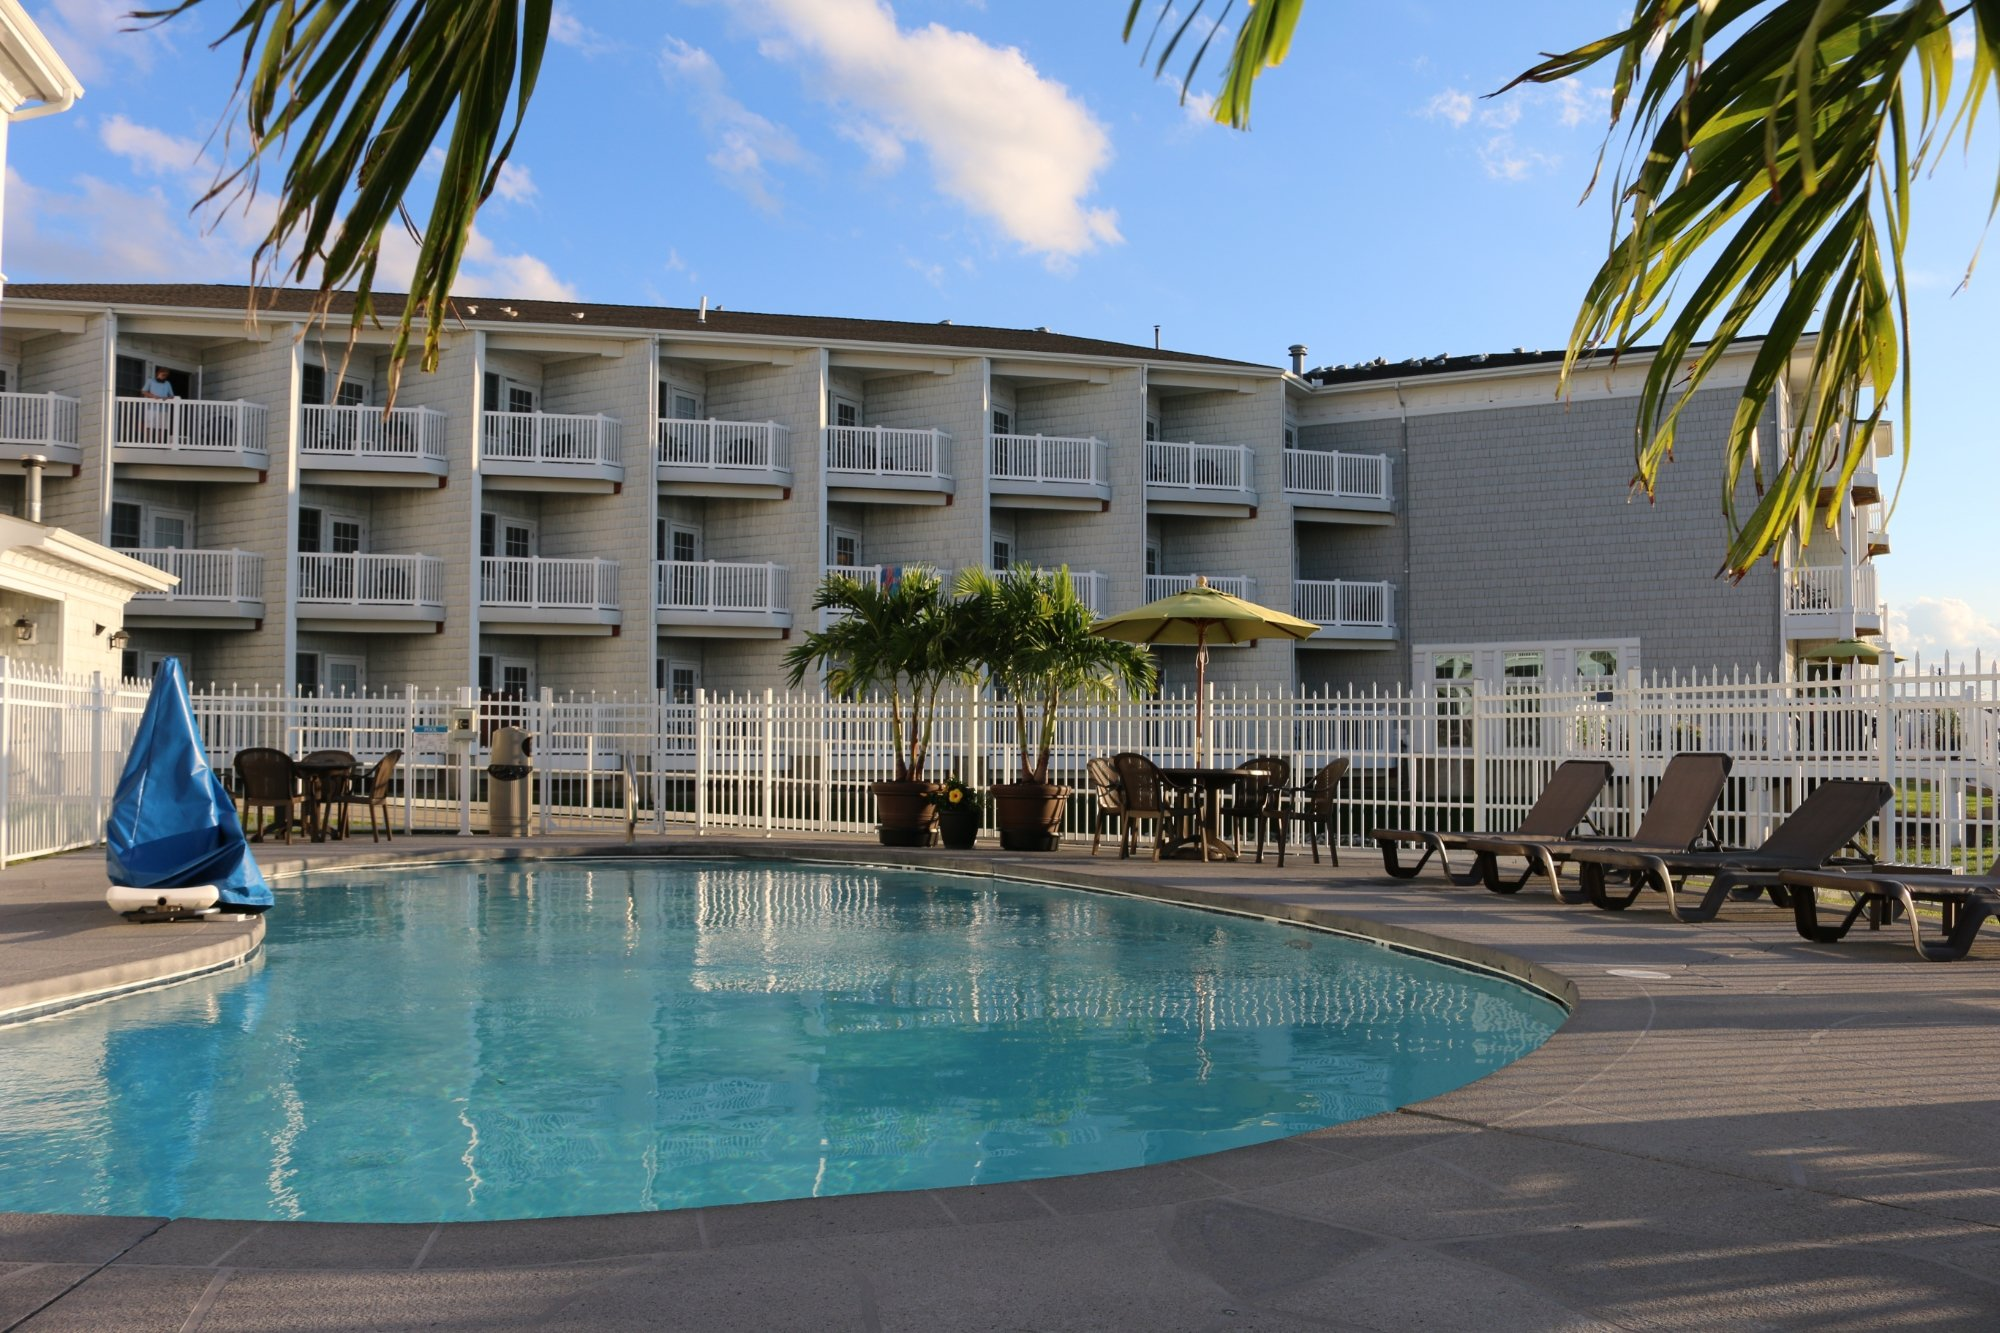 fort Suites Chincoteague Chincoteague Island VA Hotel